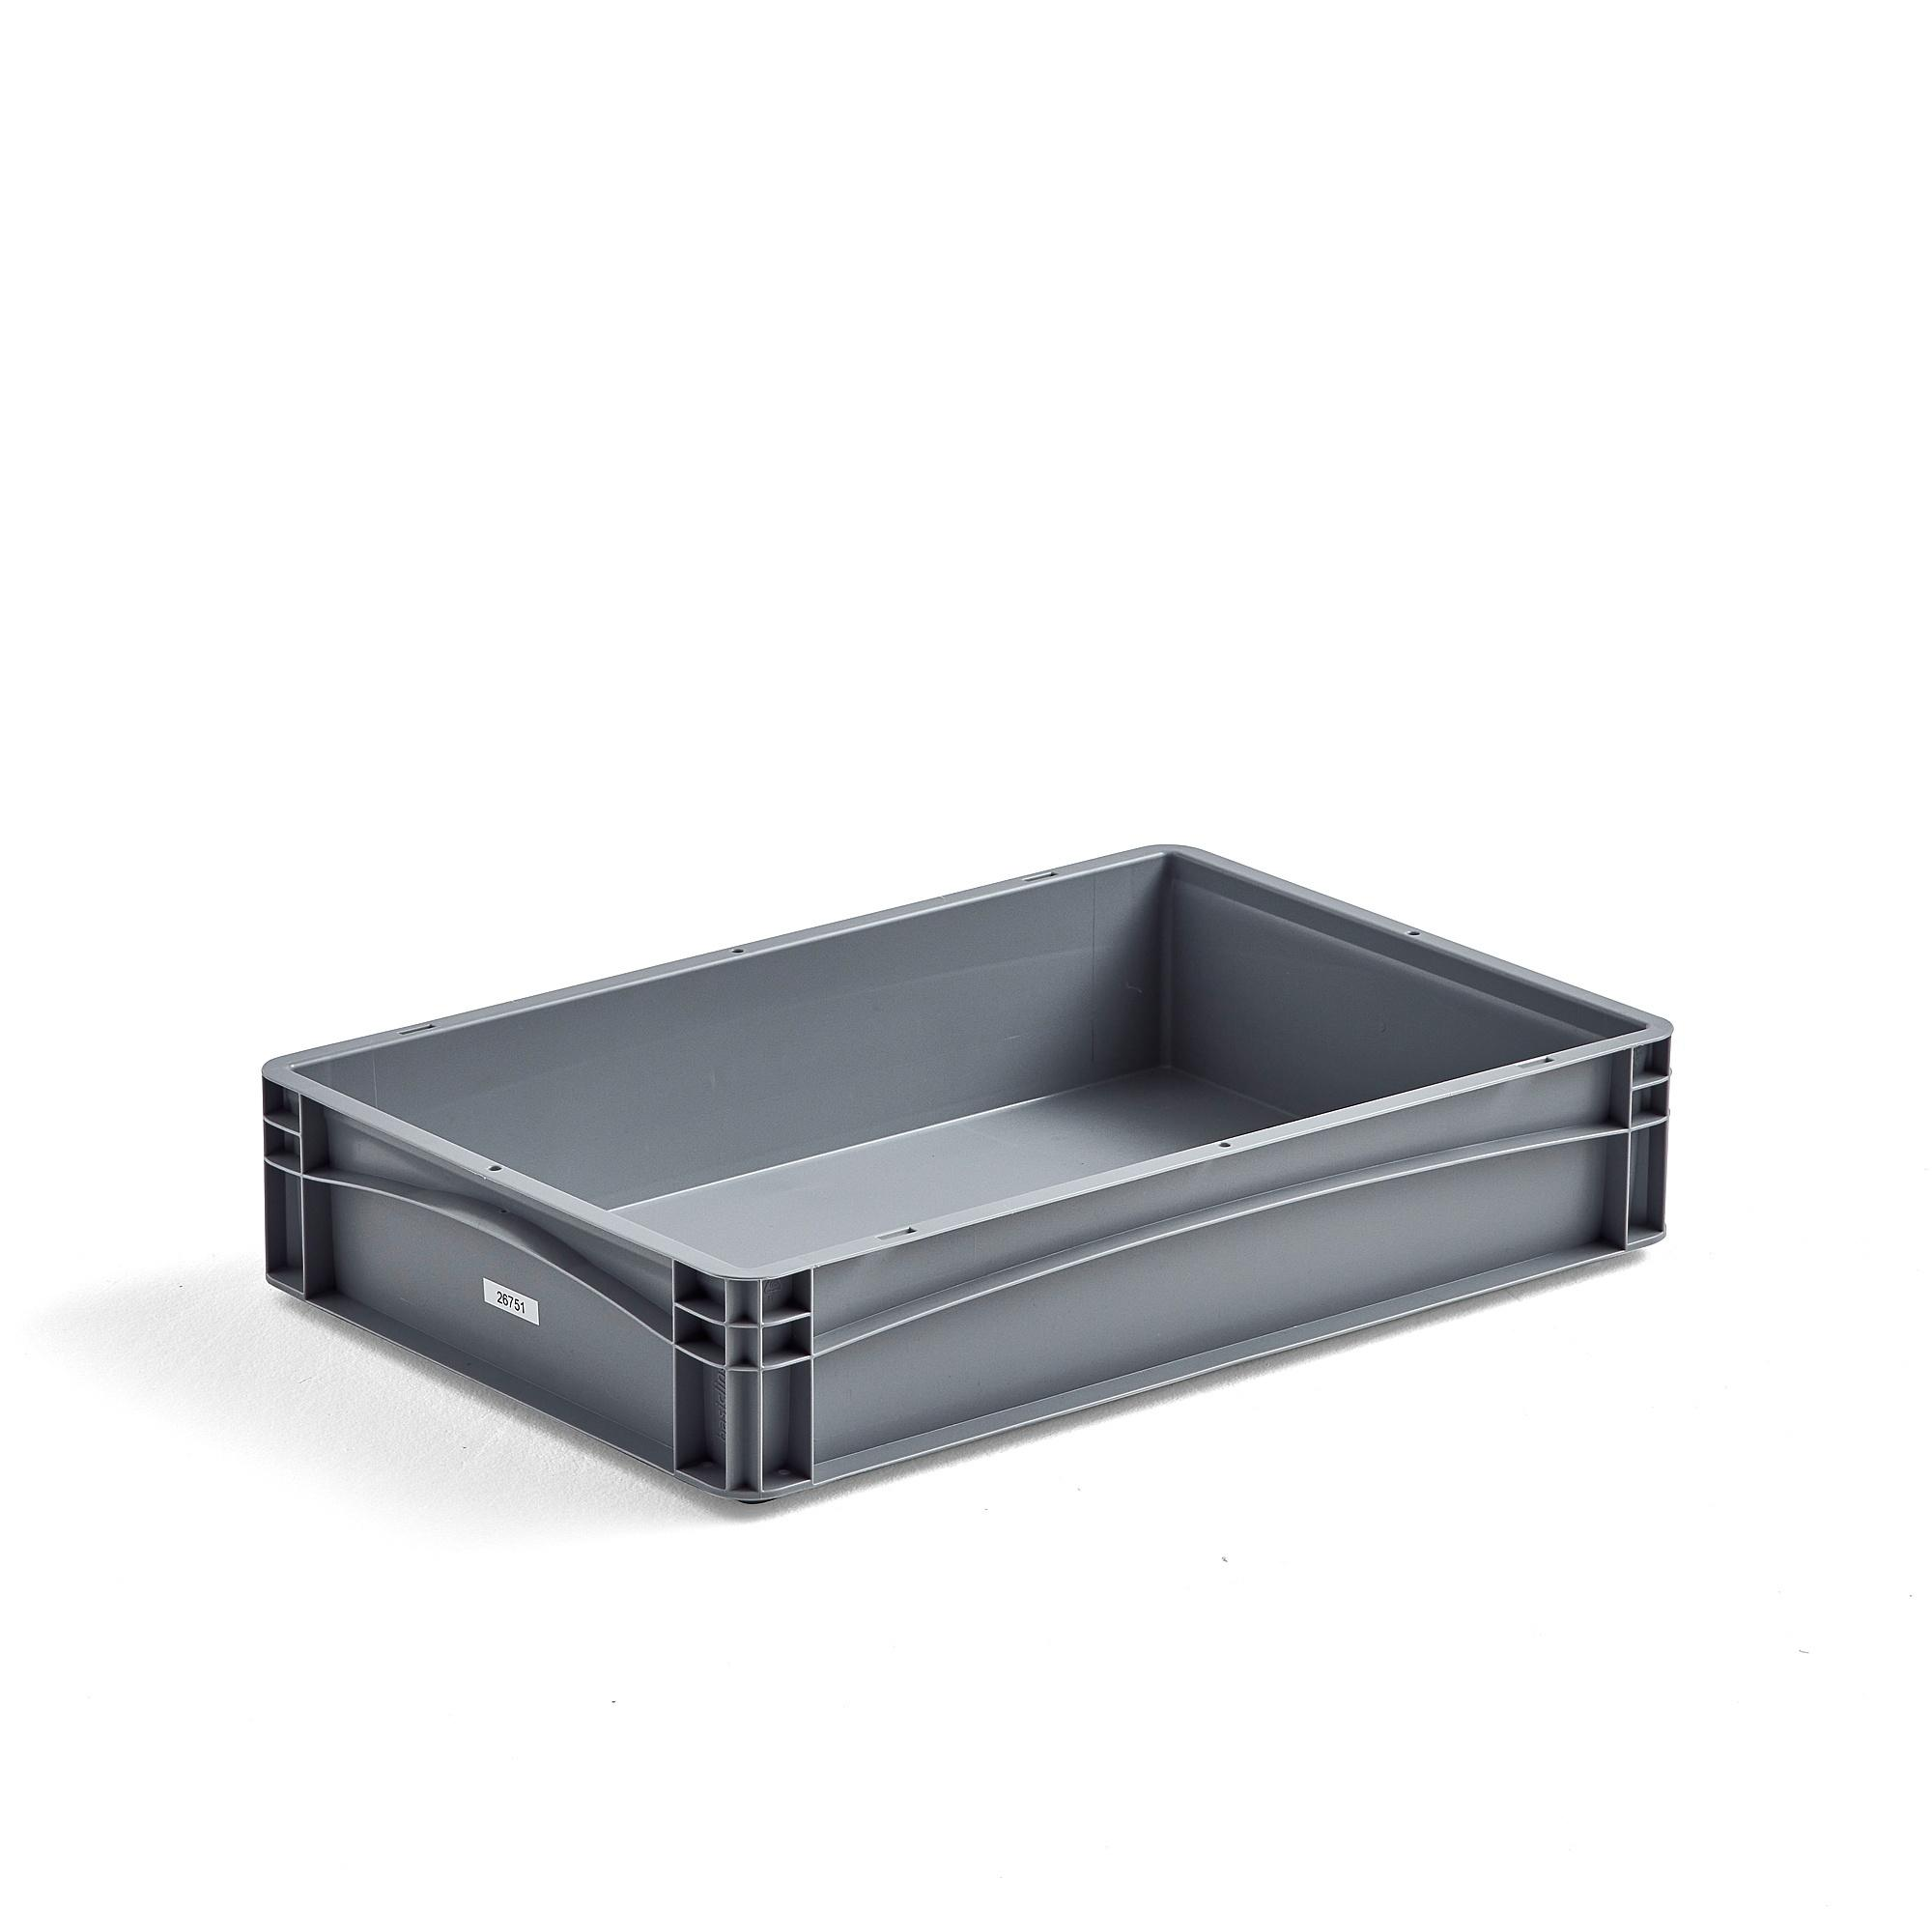 Plastová prepravka AJ EURO, 21 L, 600x400x120 mm